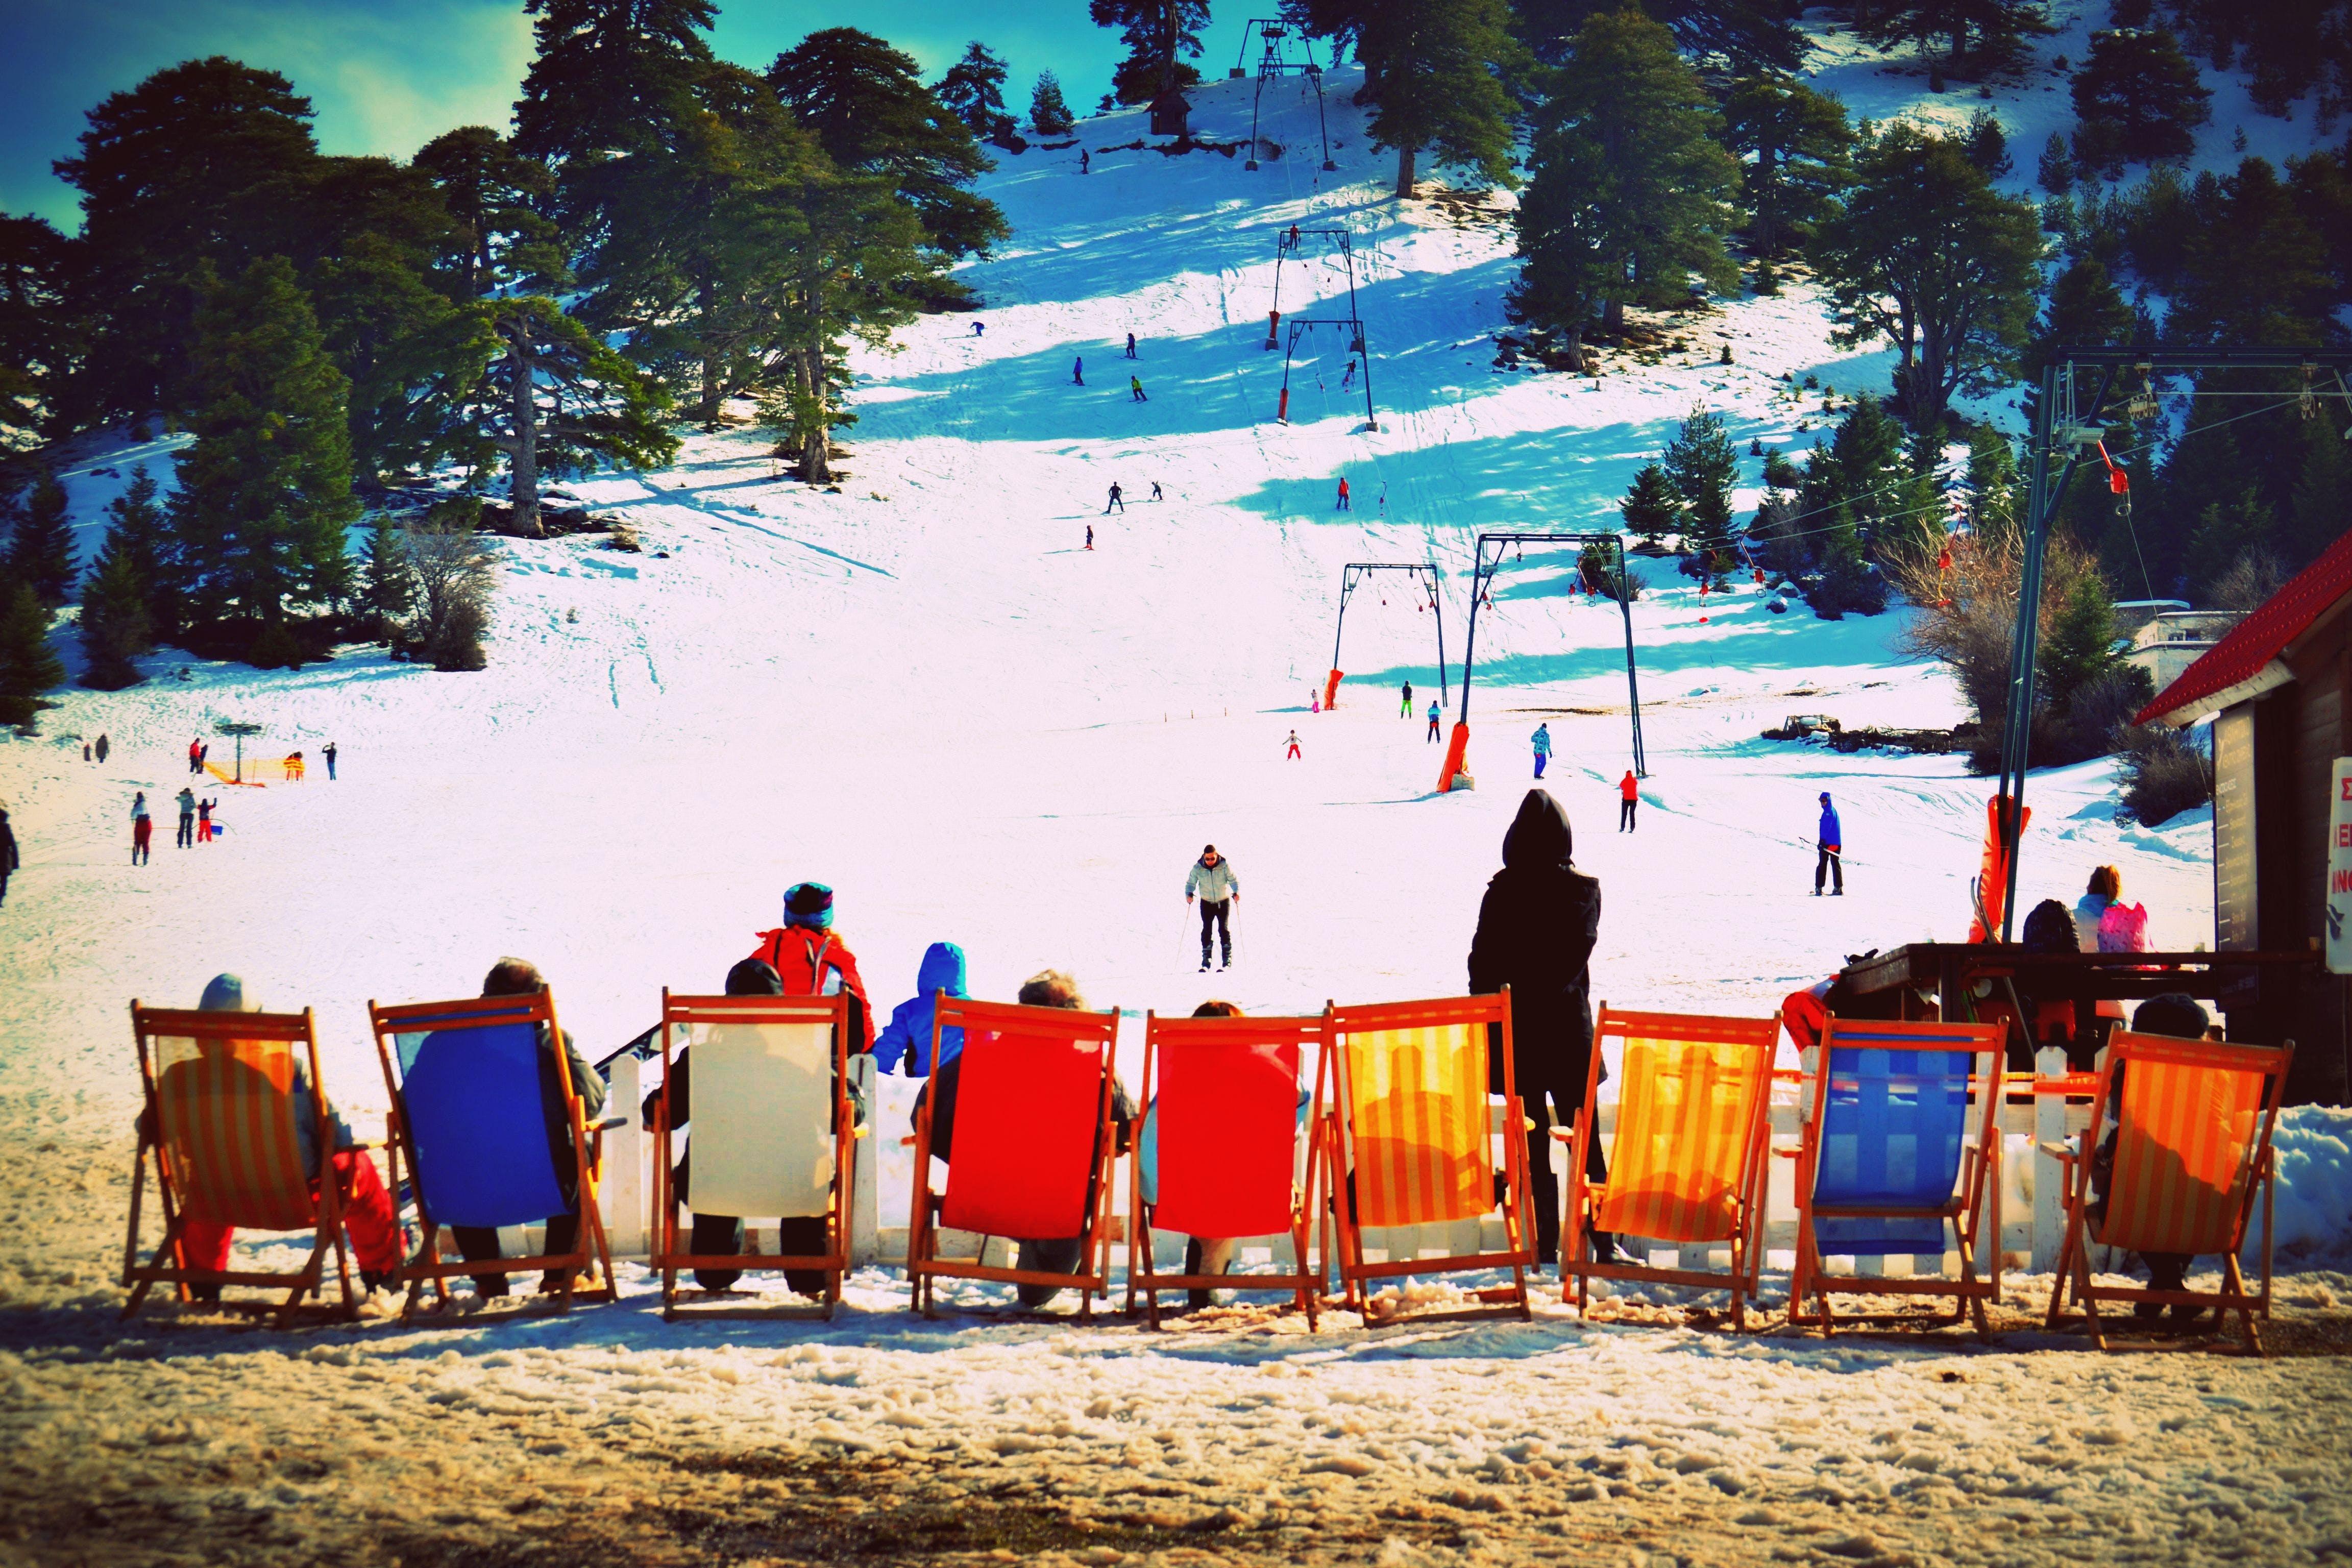 Free stock photo of snow, people, winter, lying